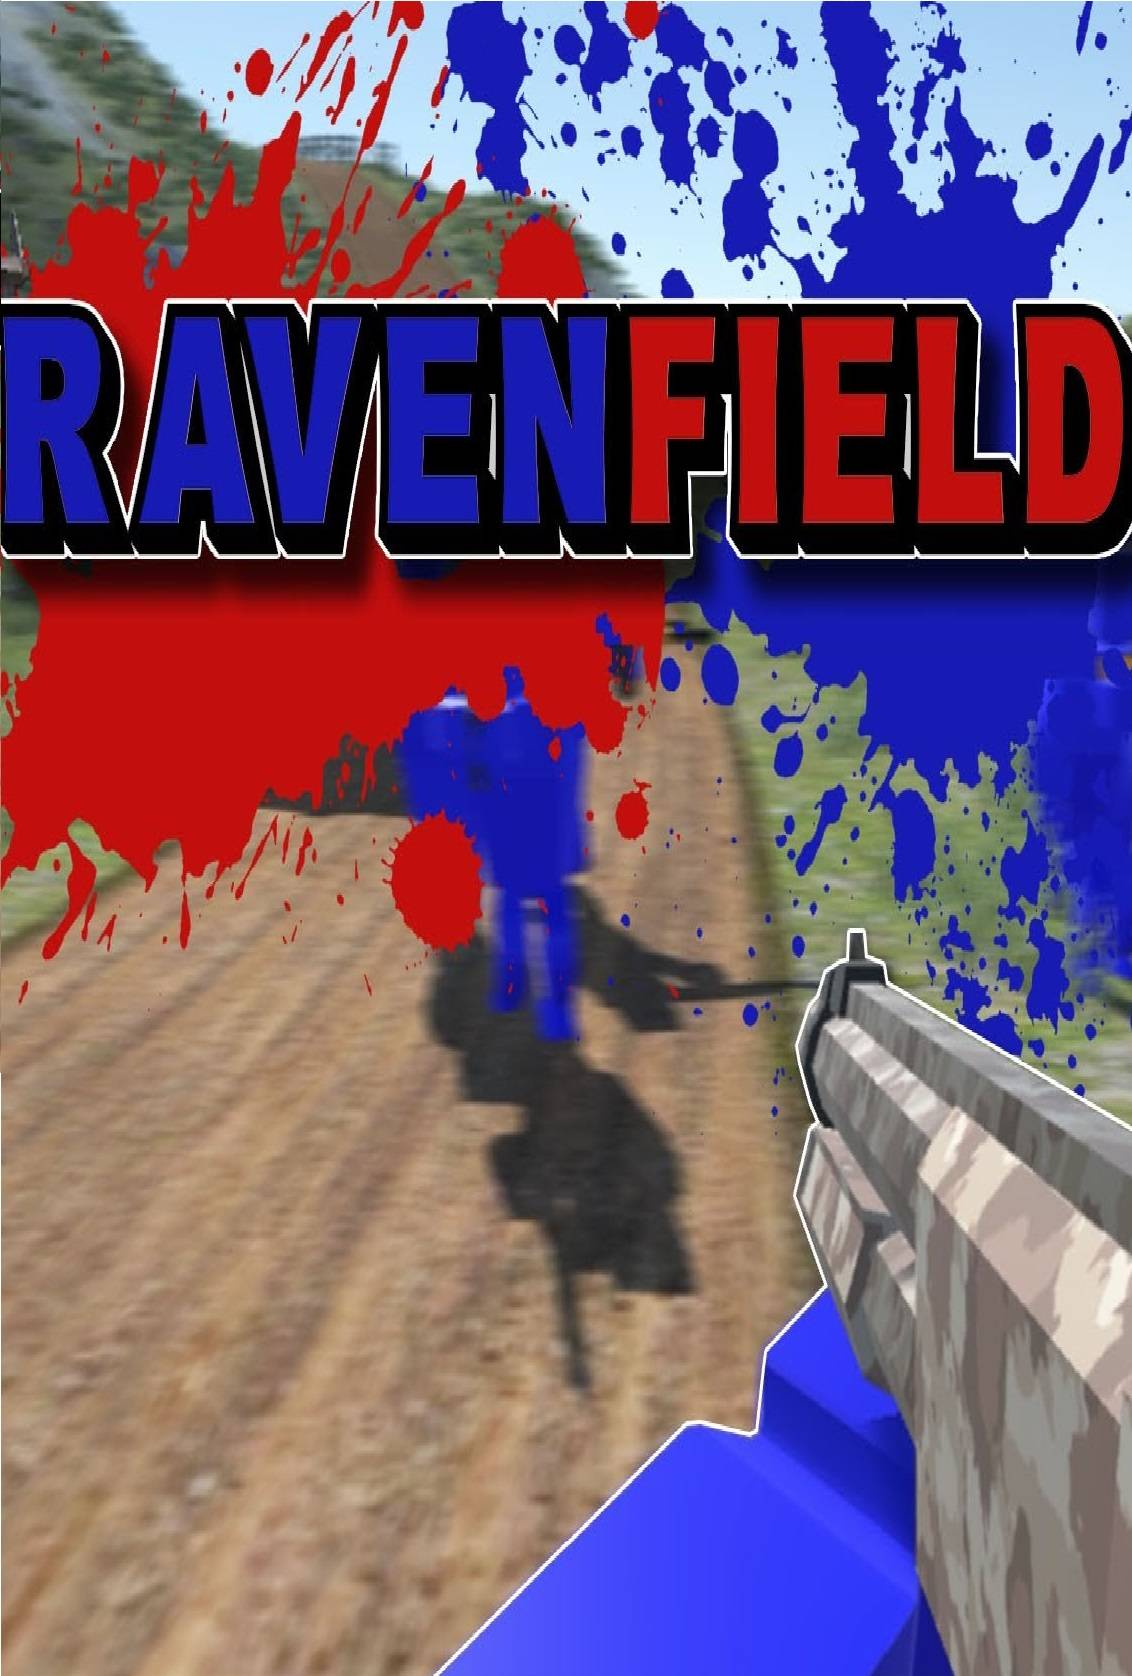 Ravenfield (2017)